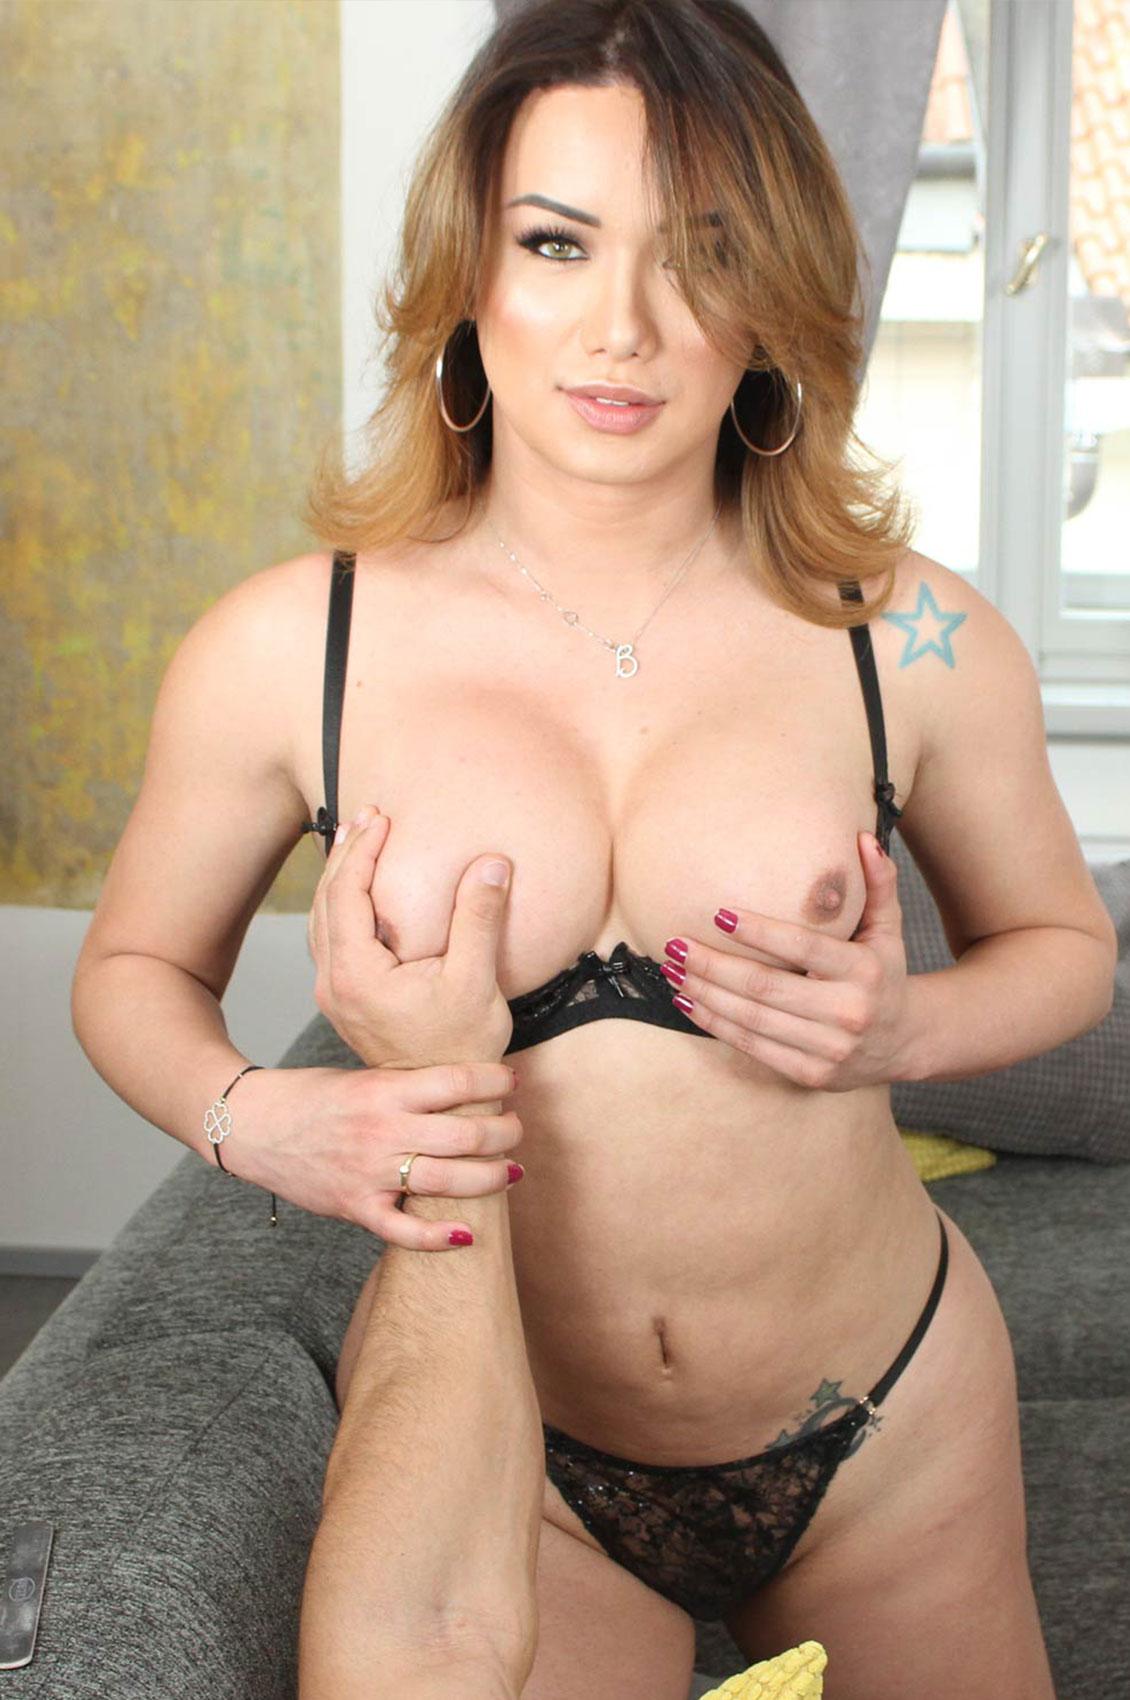 Bianka Nascimiento's VR Porn Videos, Bio & Free Nude Pics